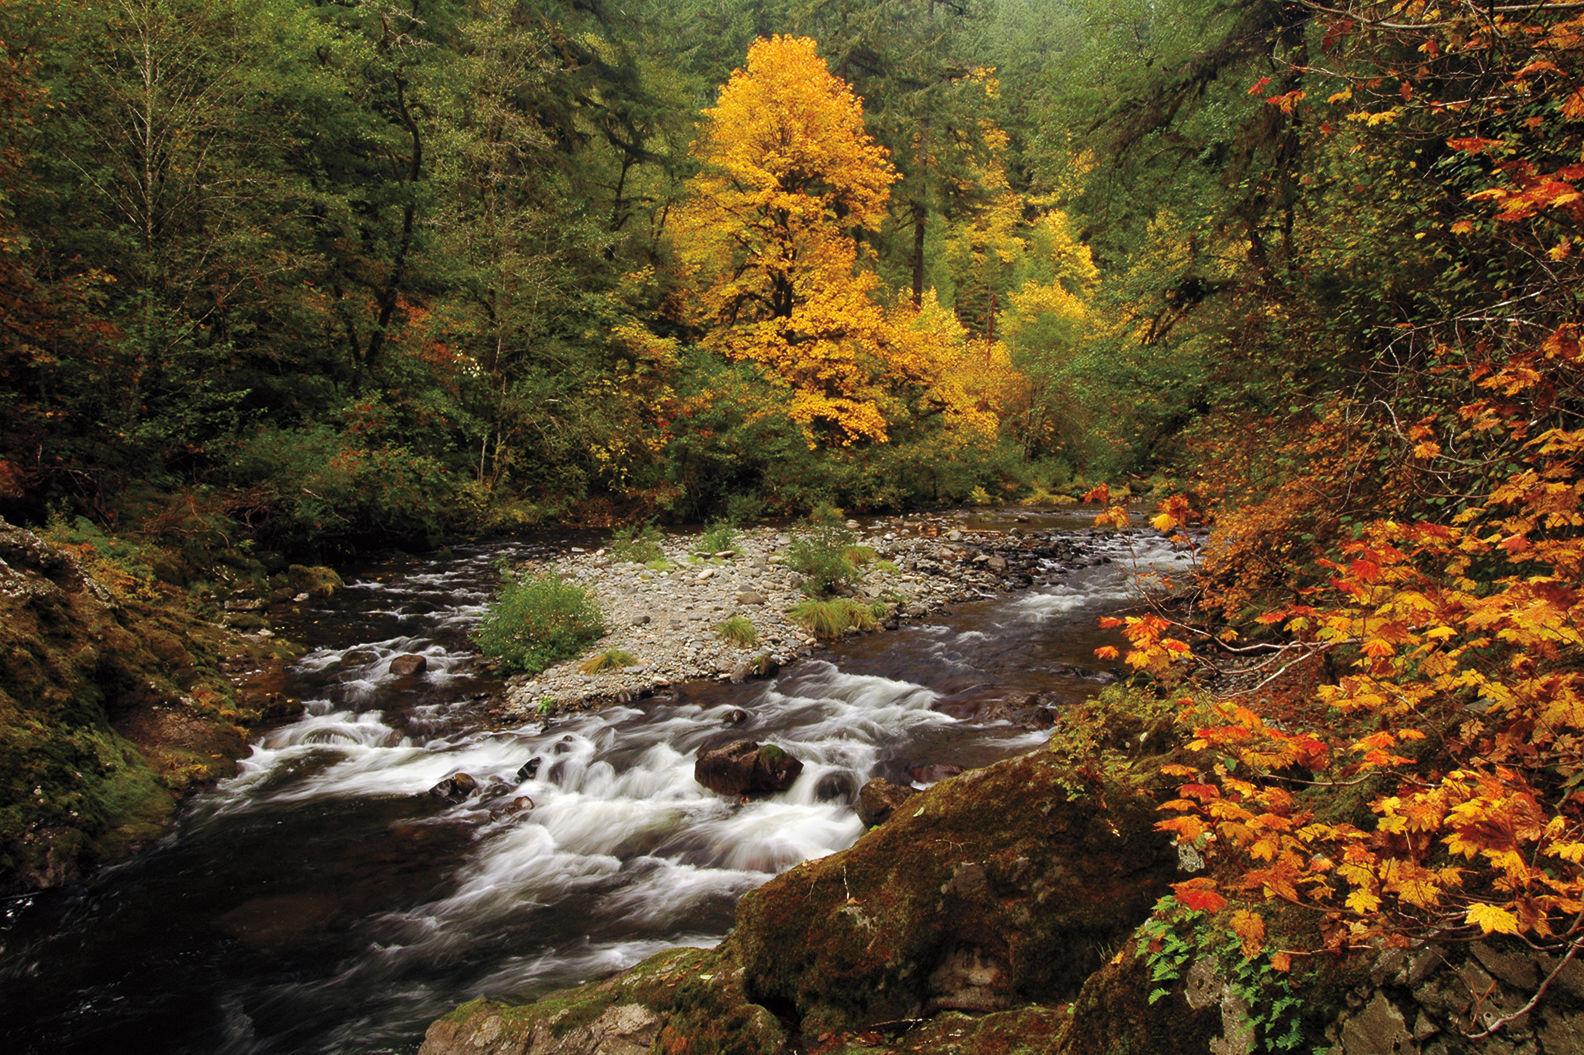 Fall creek by liefphotos.com zqsxsj